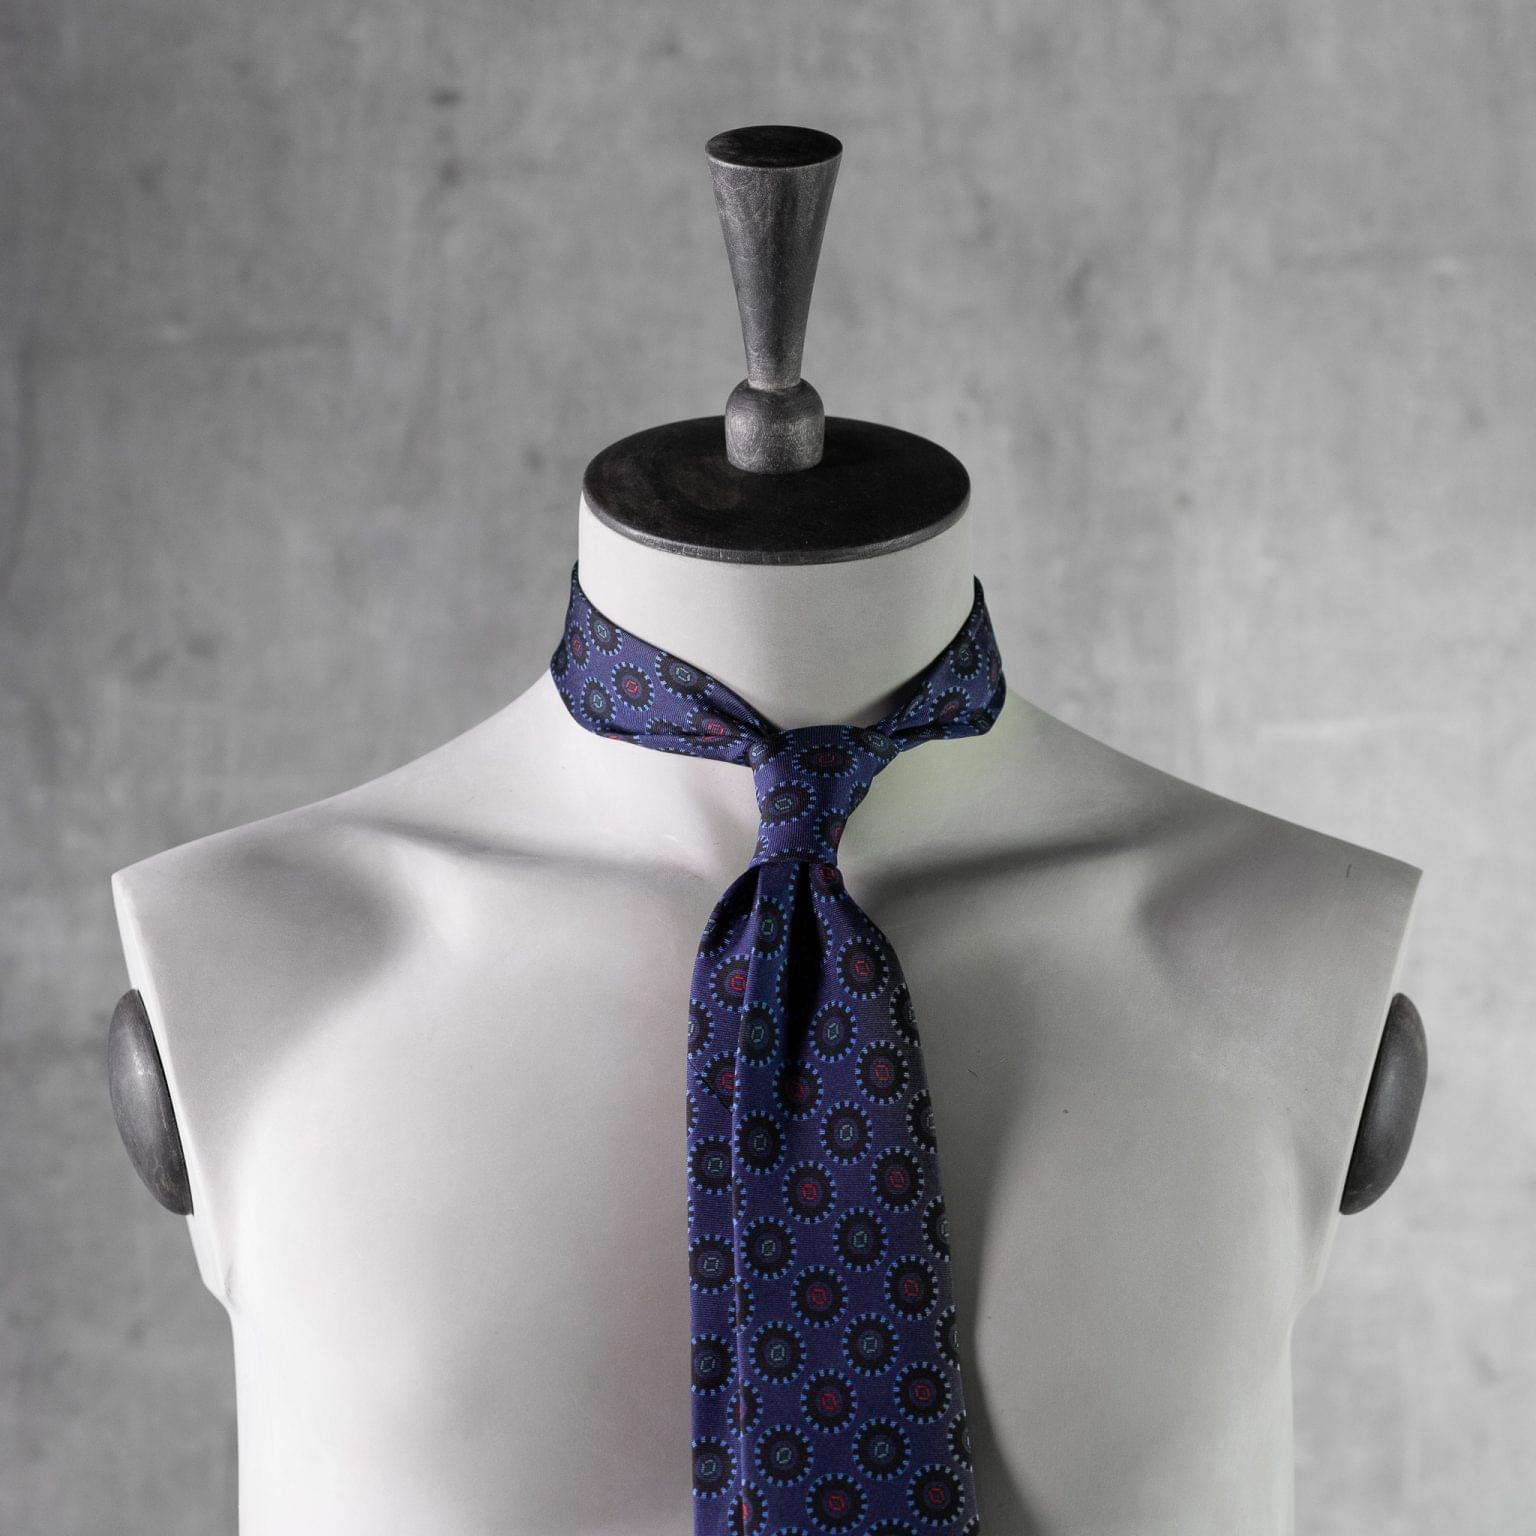 PRINTED-SILK-SEDA-ESTAMPADA-0484-Tie-Initials-Corbata-Iniciales-The-Seelk-3